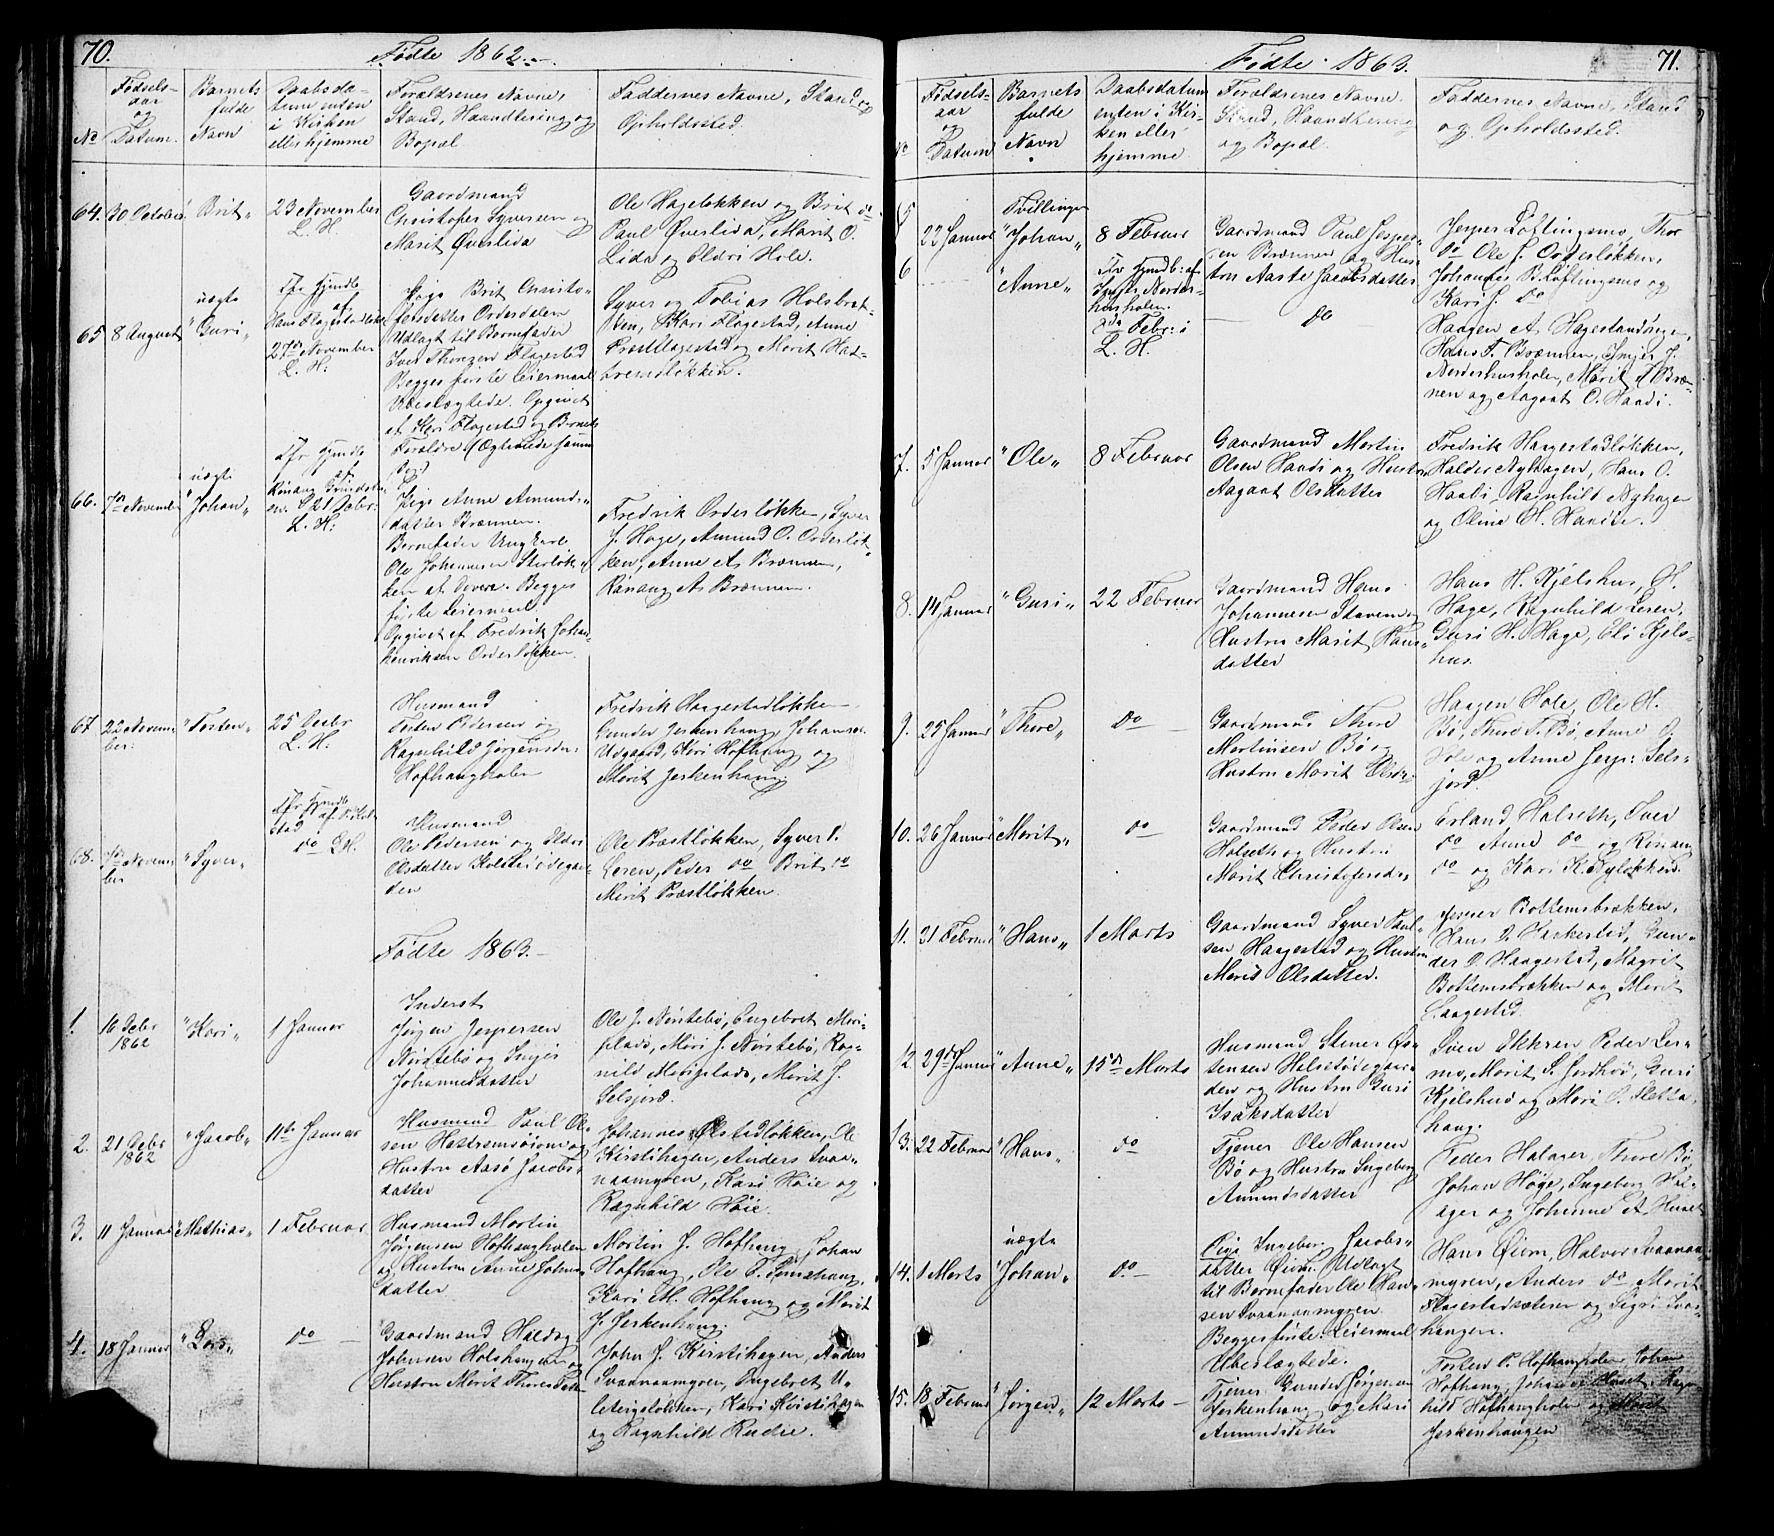 SAH, Lesja prestekontor, Klokkerbok nr. 5, 1850-1894, s. 70-71